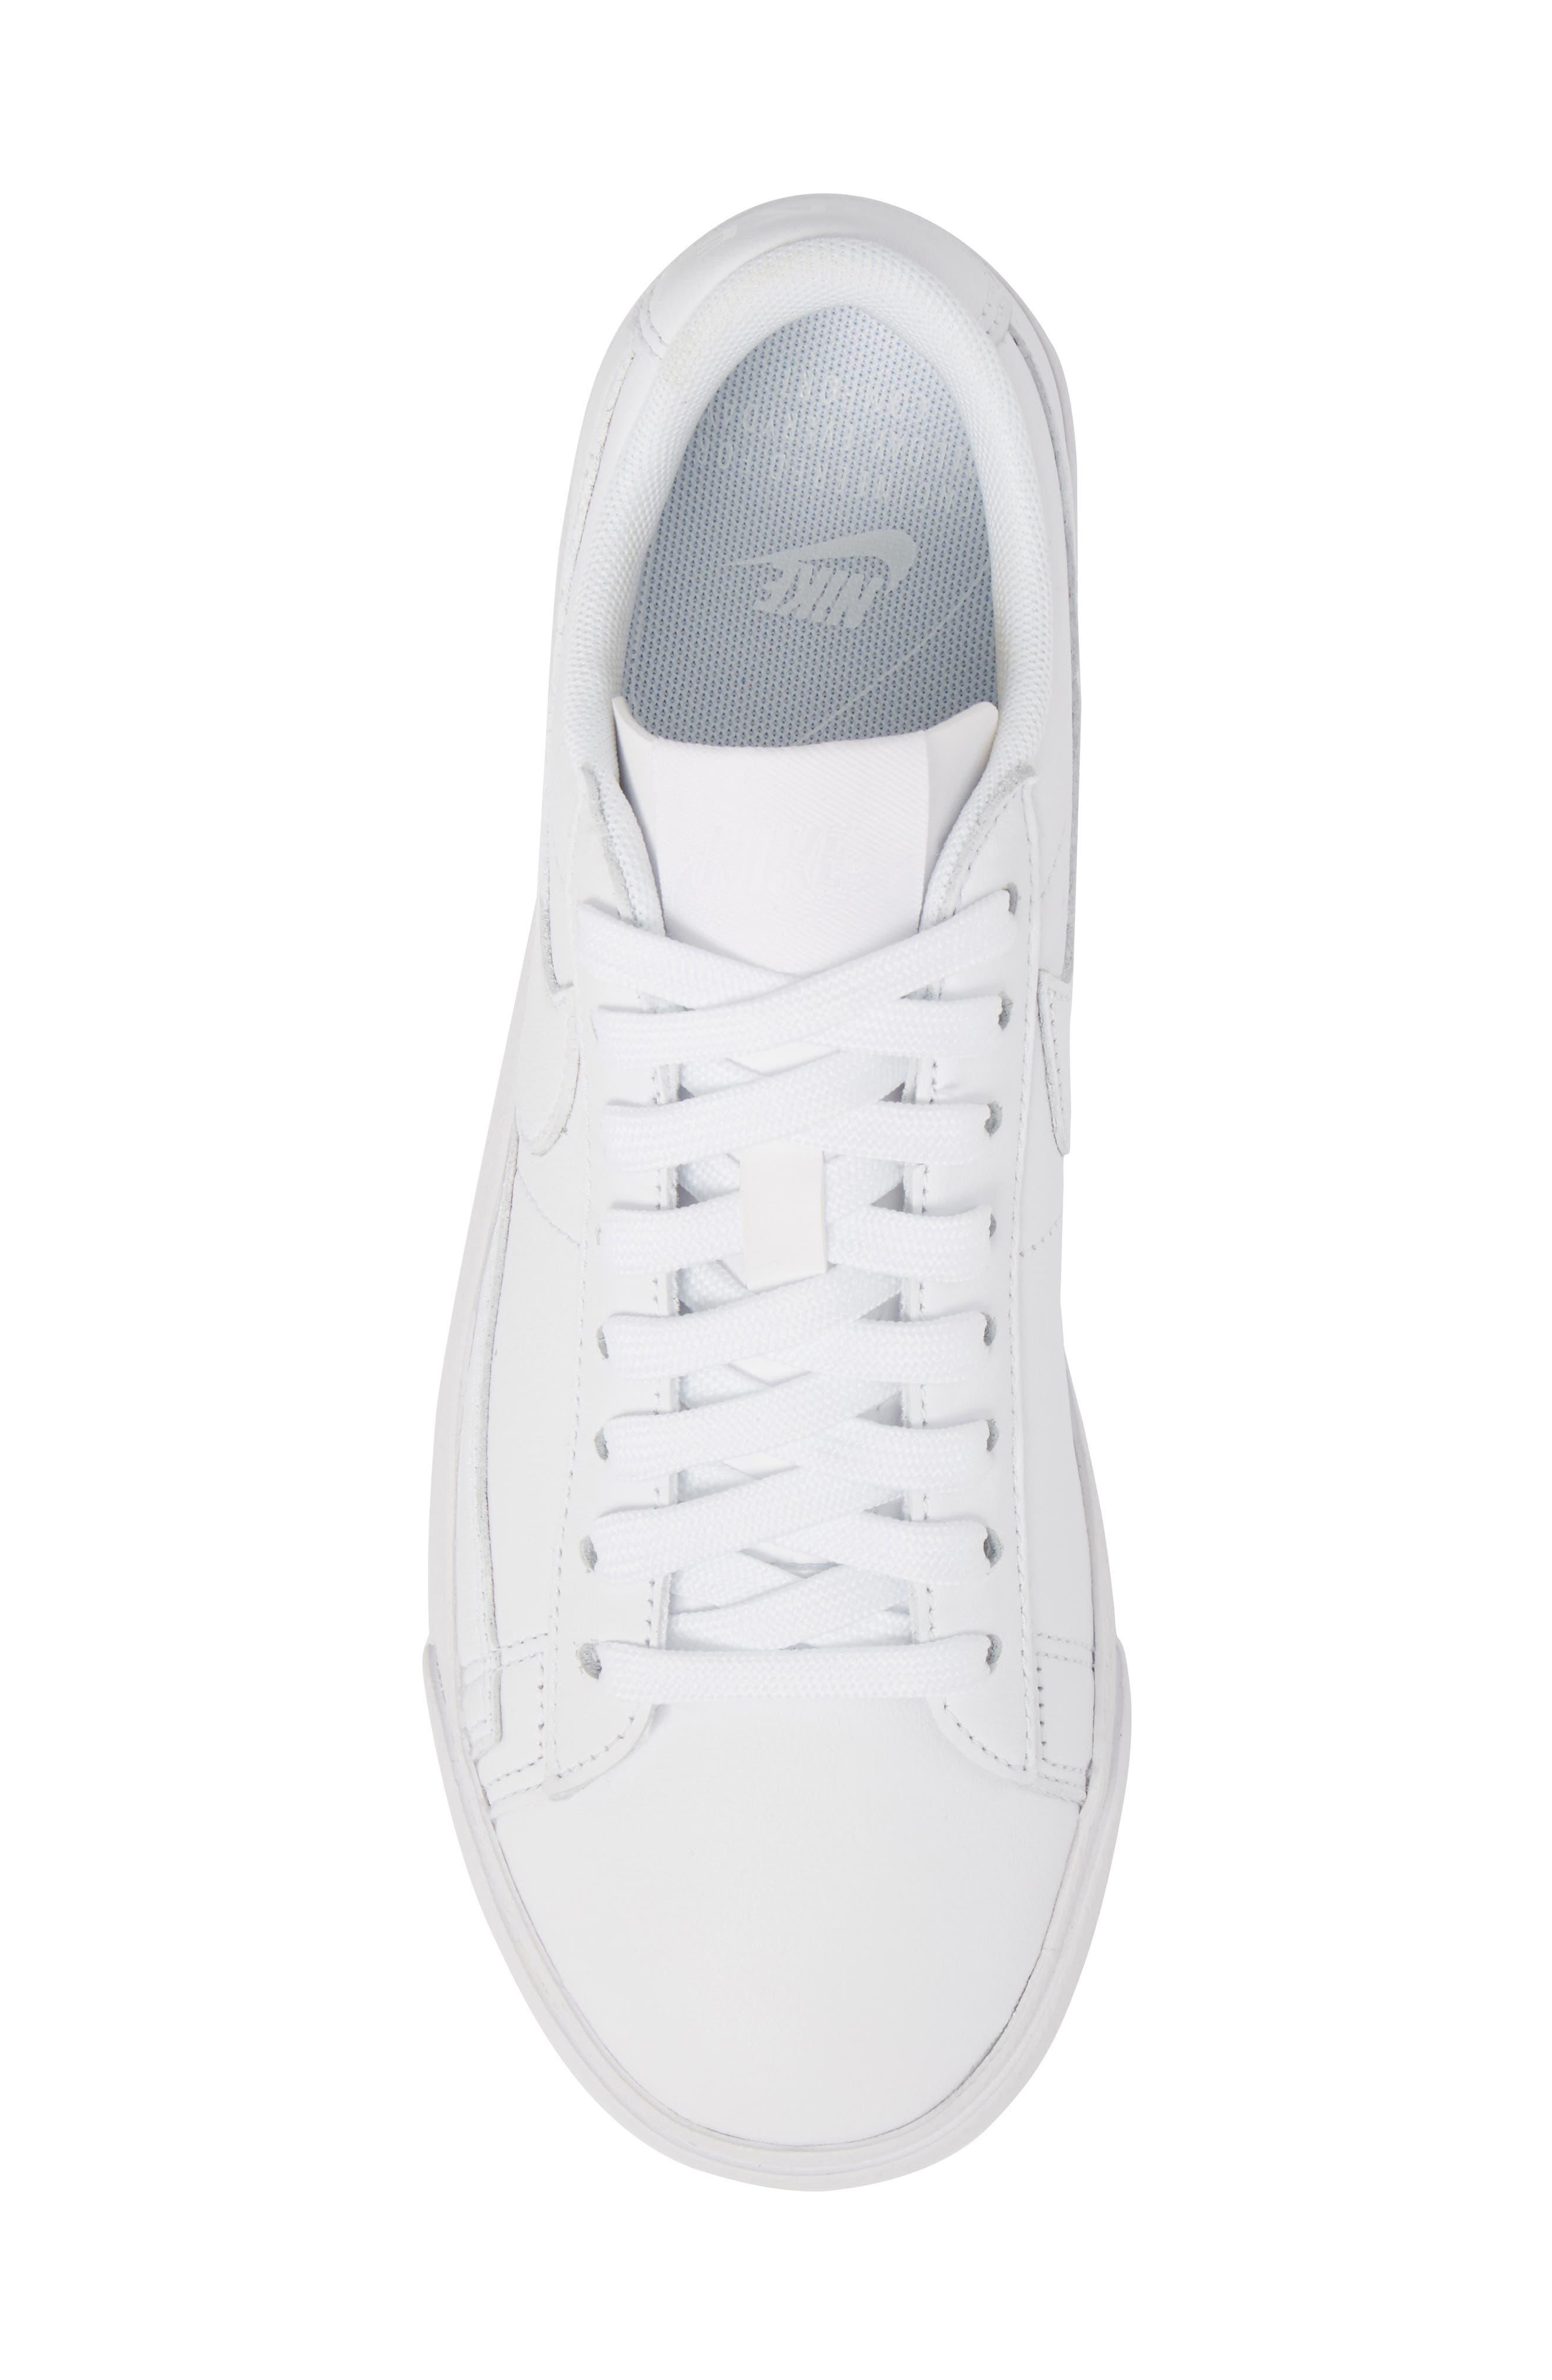 Blazer Low LE Sneaker,                             Alternate thumbnail 5, color,                             104